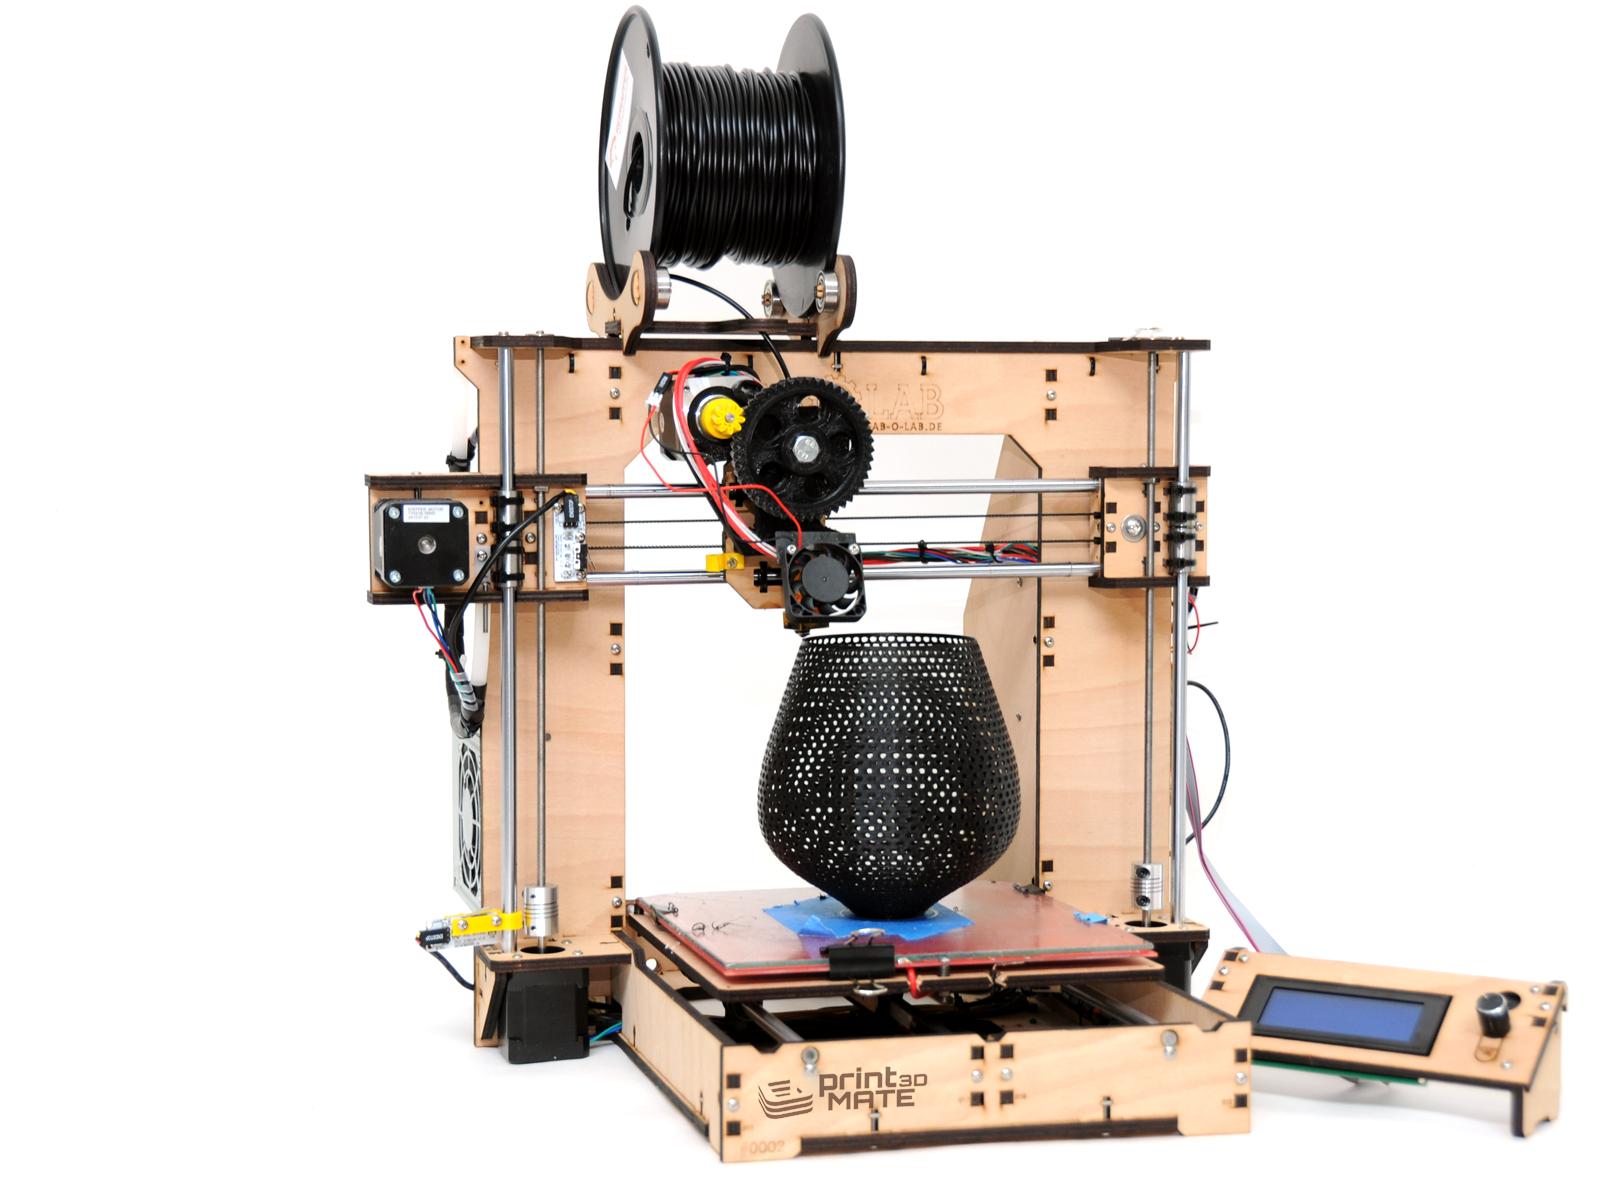 Igo3d Printmate 3d Collaborate To Launch Printmate 3d